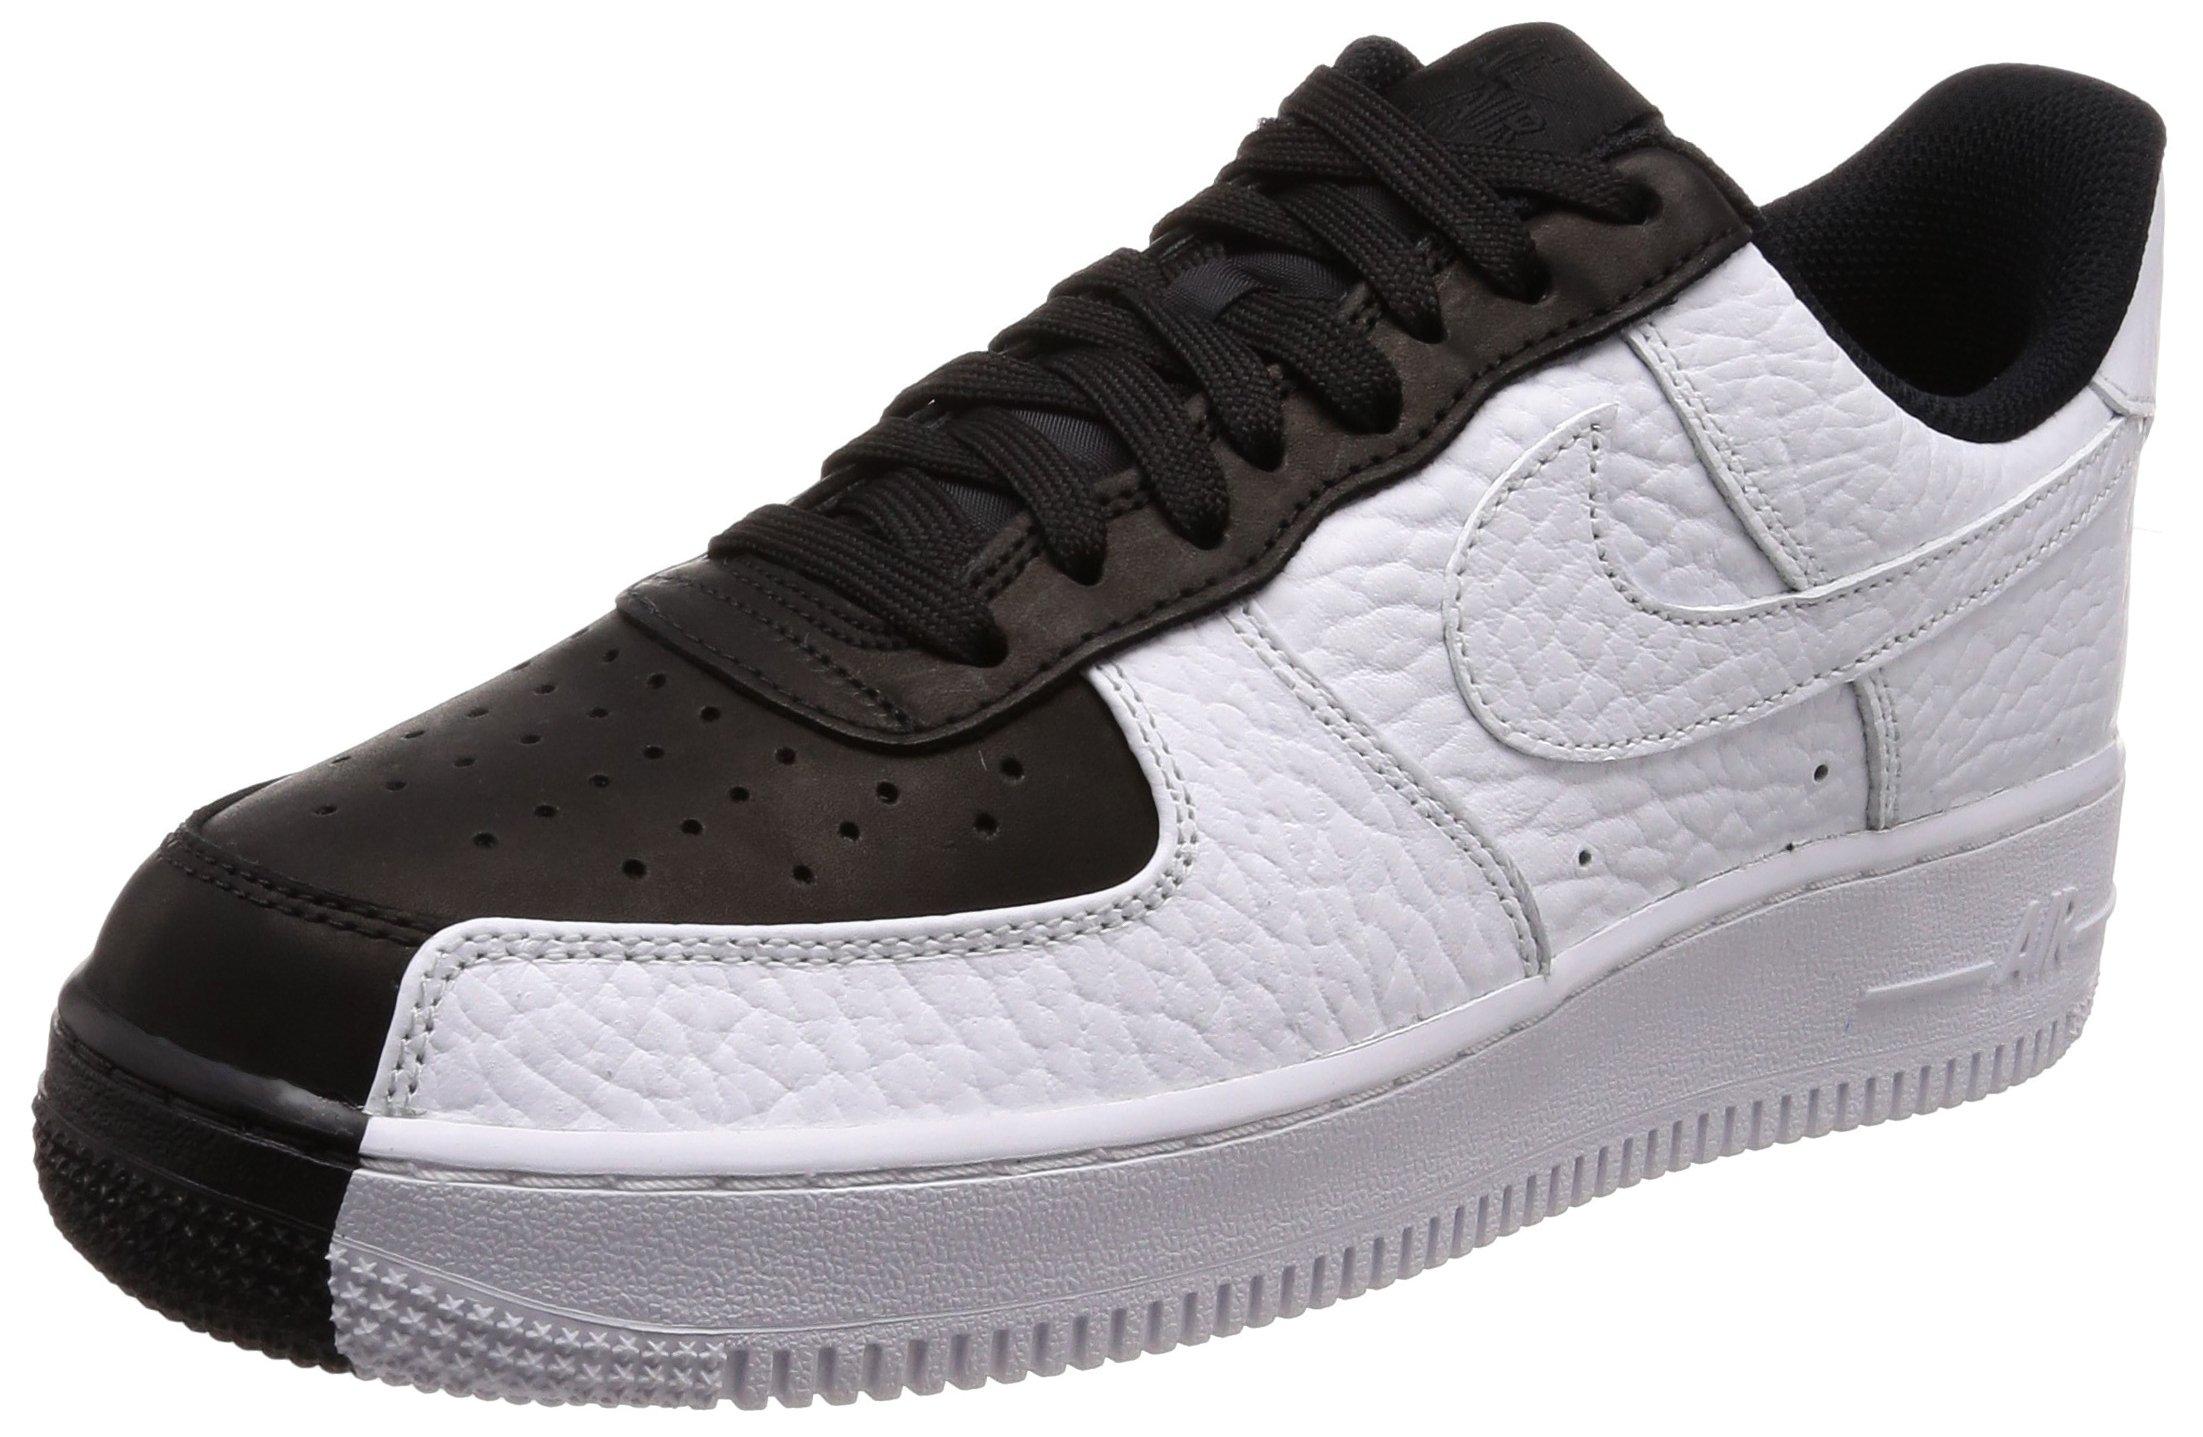 Nike Men's AIR Force 1 '07 Premium Shoe WhiteBlack (10 D(M) US)